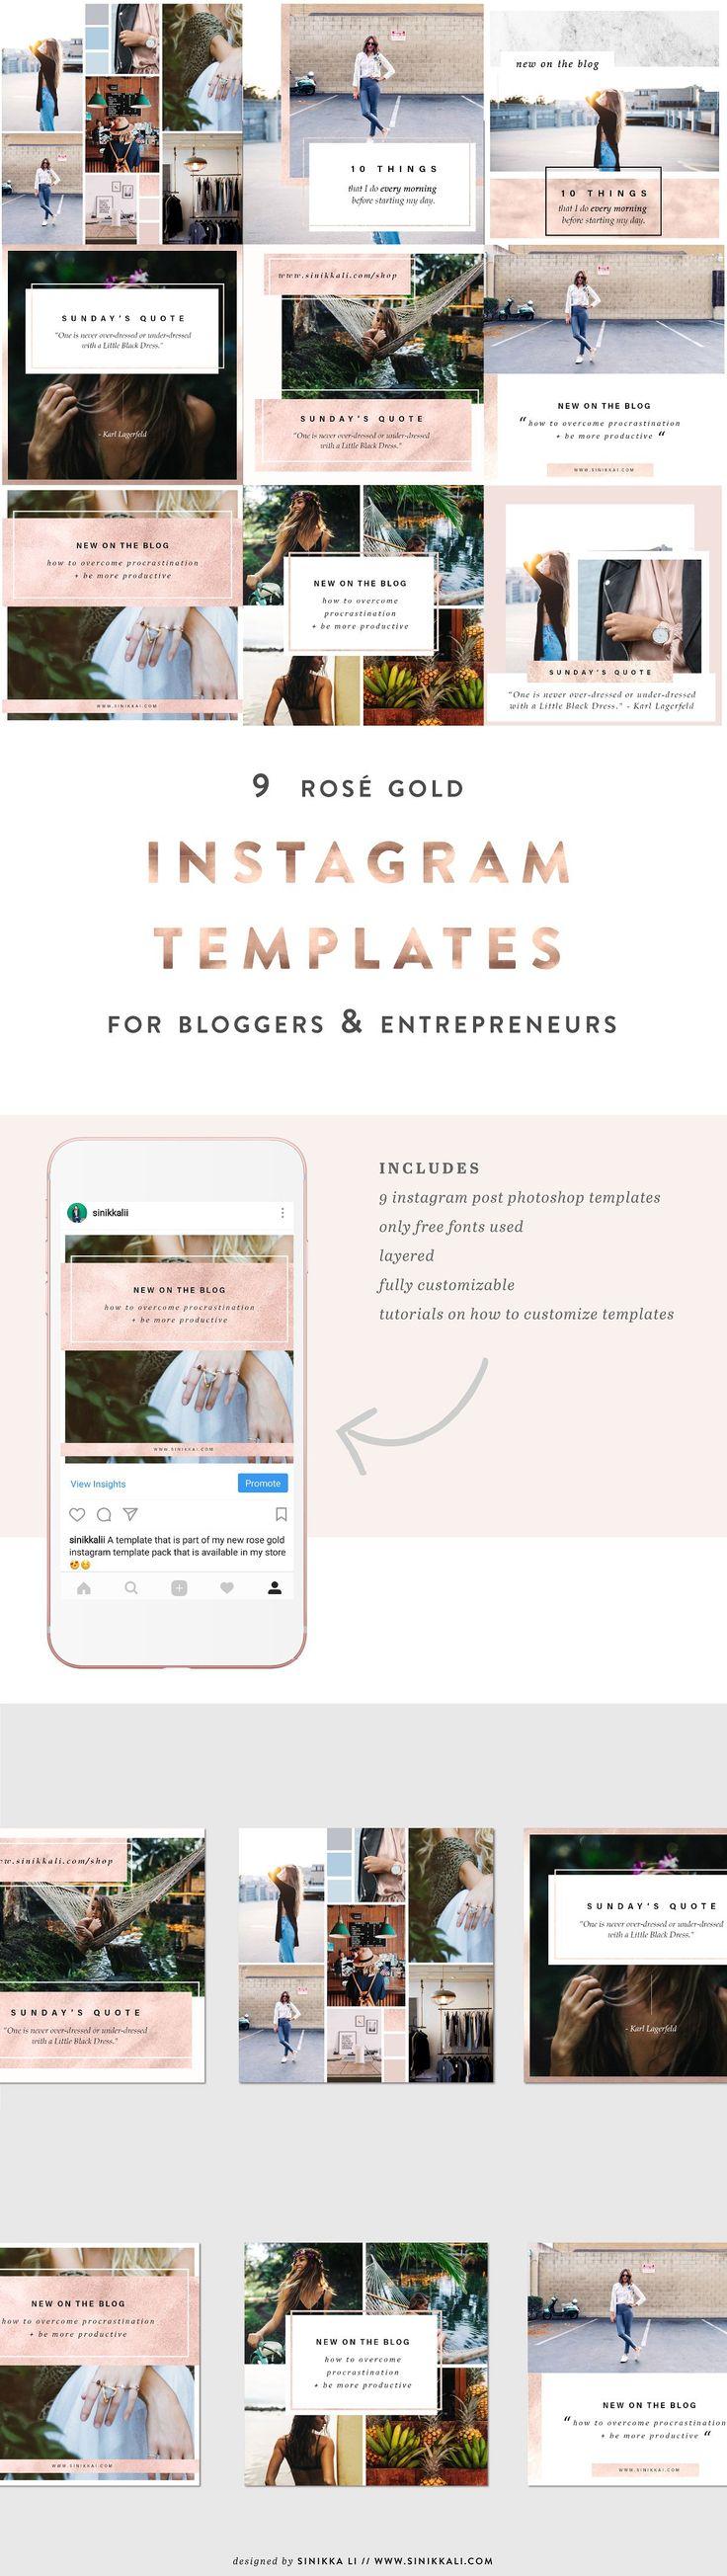 9 Rose Gold Instagram PSD Templates - Web Elements #socialmedia #templates #instagram #pinterest #facebook #twitter #design #post #mockup #web #webdesign #socialdesign #lifestyle